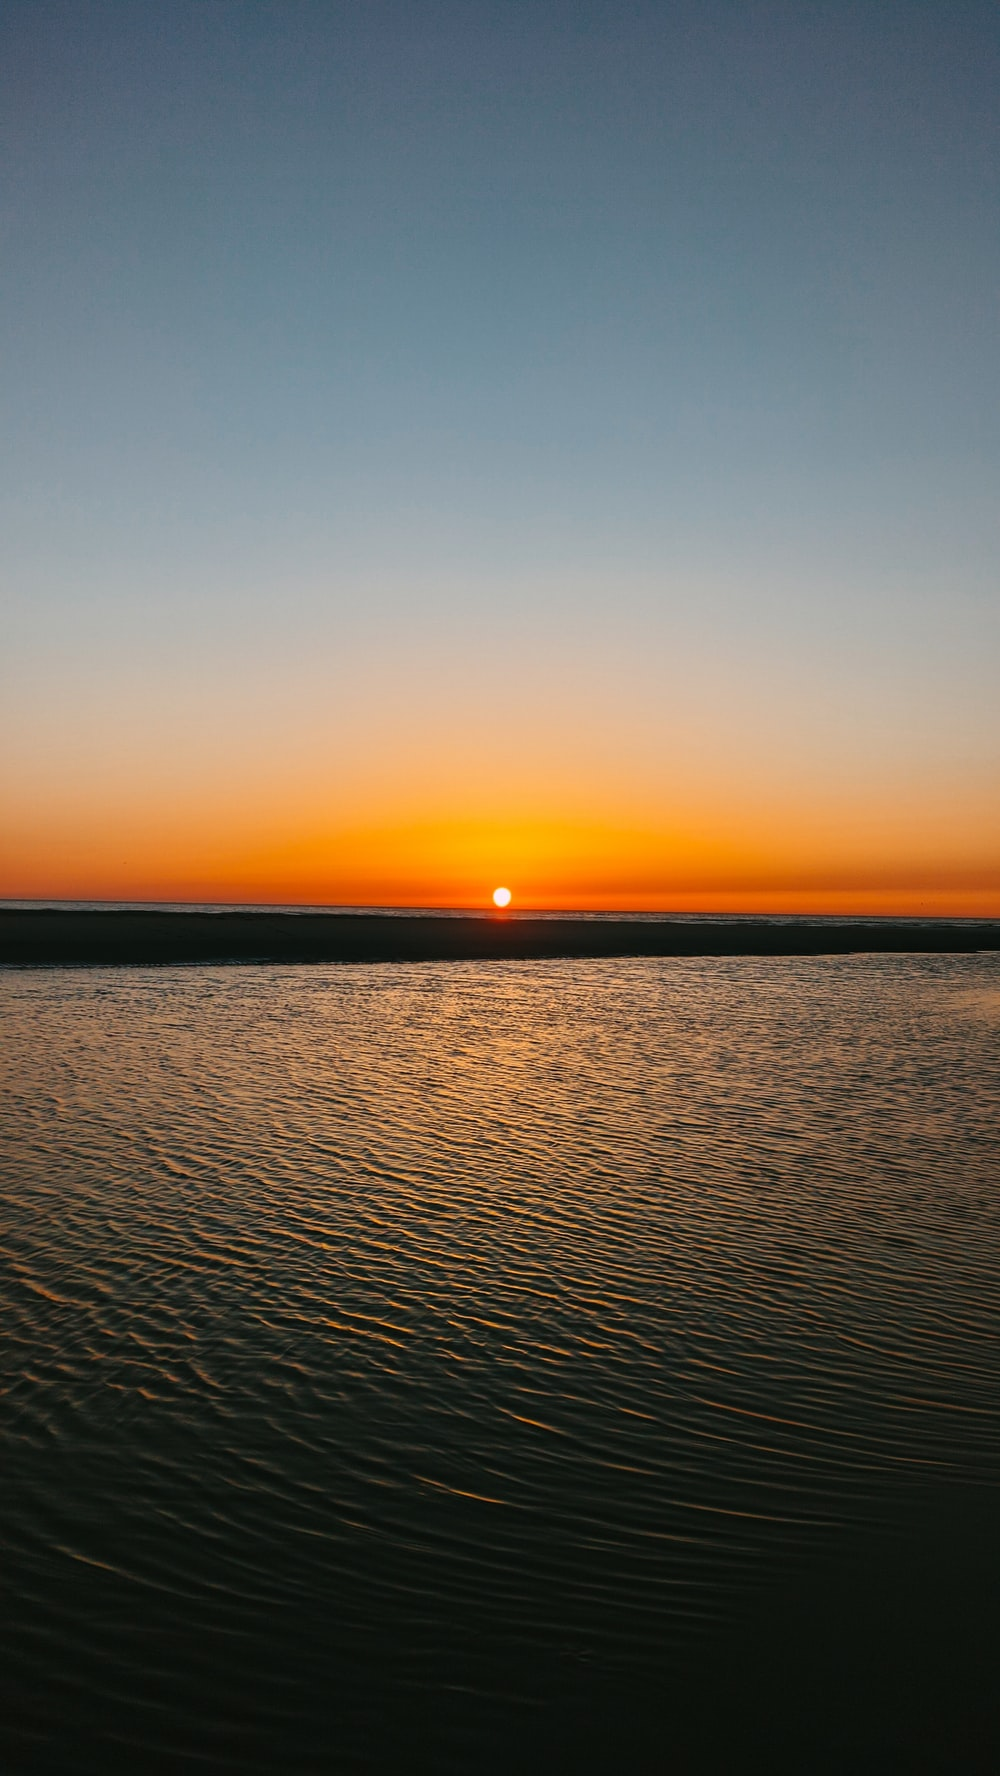 calm sea under orange sky during sunset